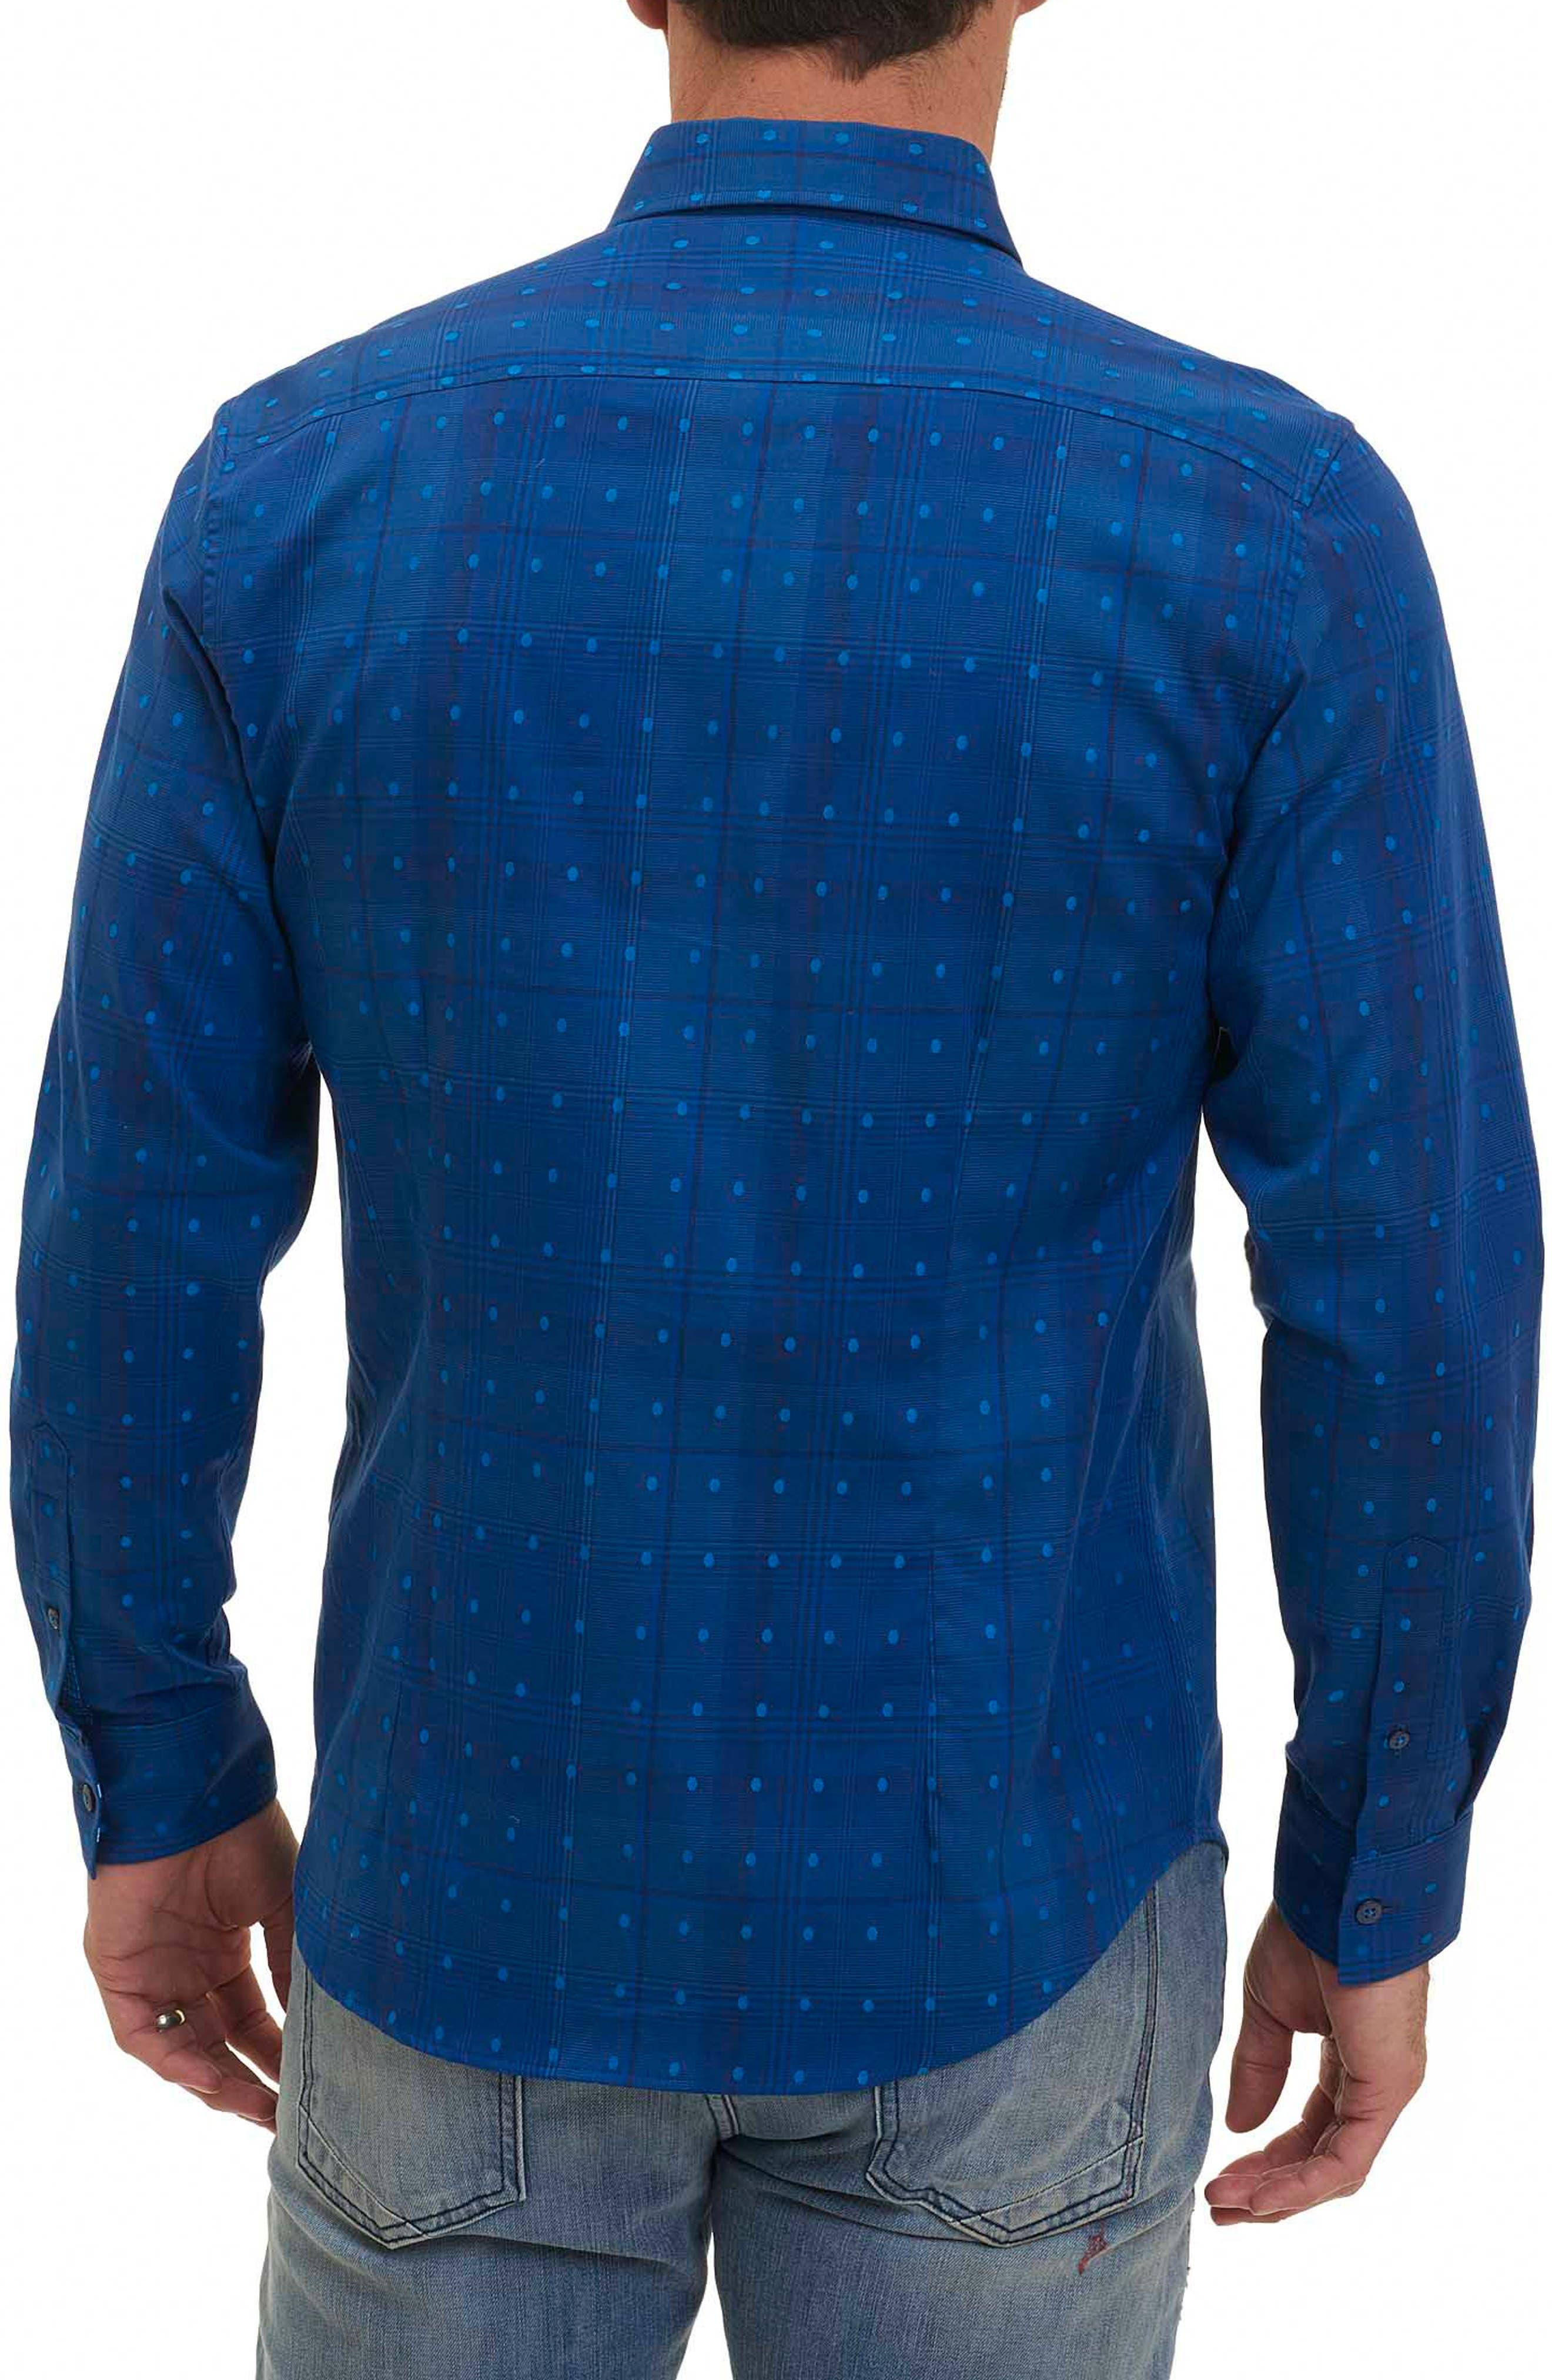 Pete Tailored Fit Print Sport Shirt,                             Alternate thumbnail 2, color,                             410